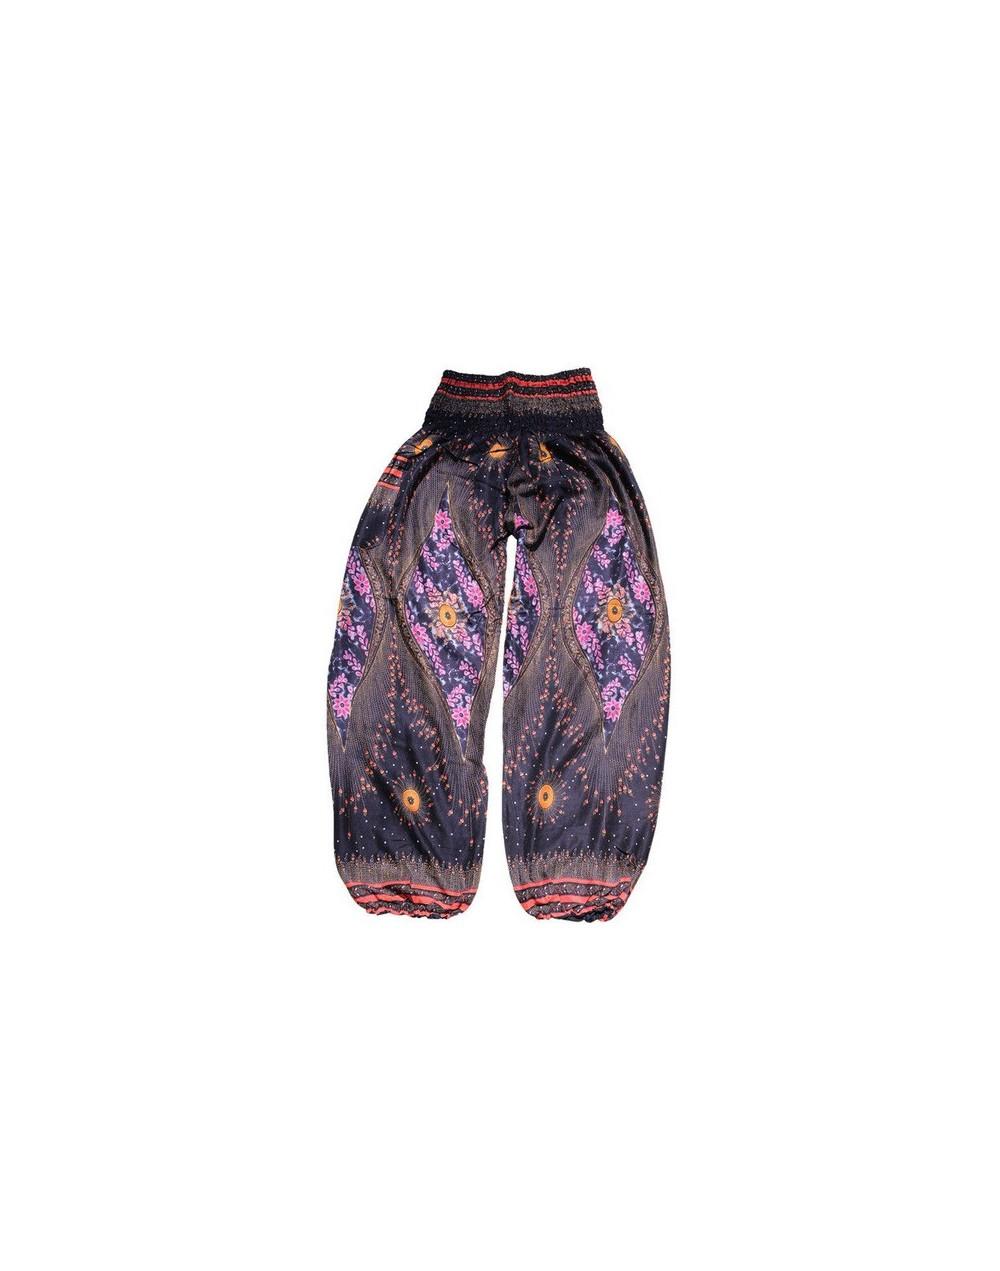 Summer Beach Boho High Waist Harem Pants Women Bloomers Plus Size Print Trousers Women Fashion Workout Pant 3 Colors - Black...